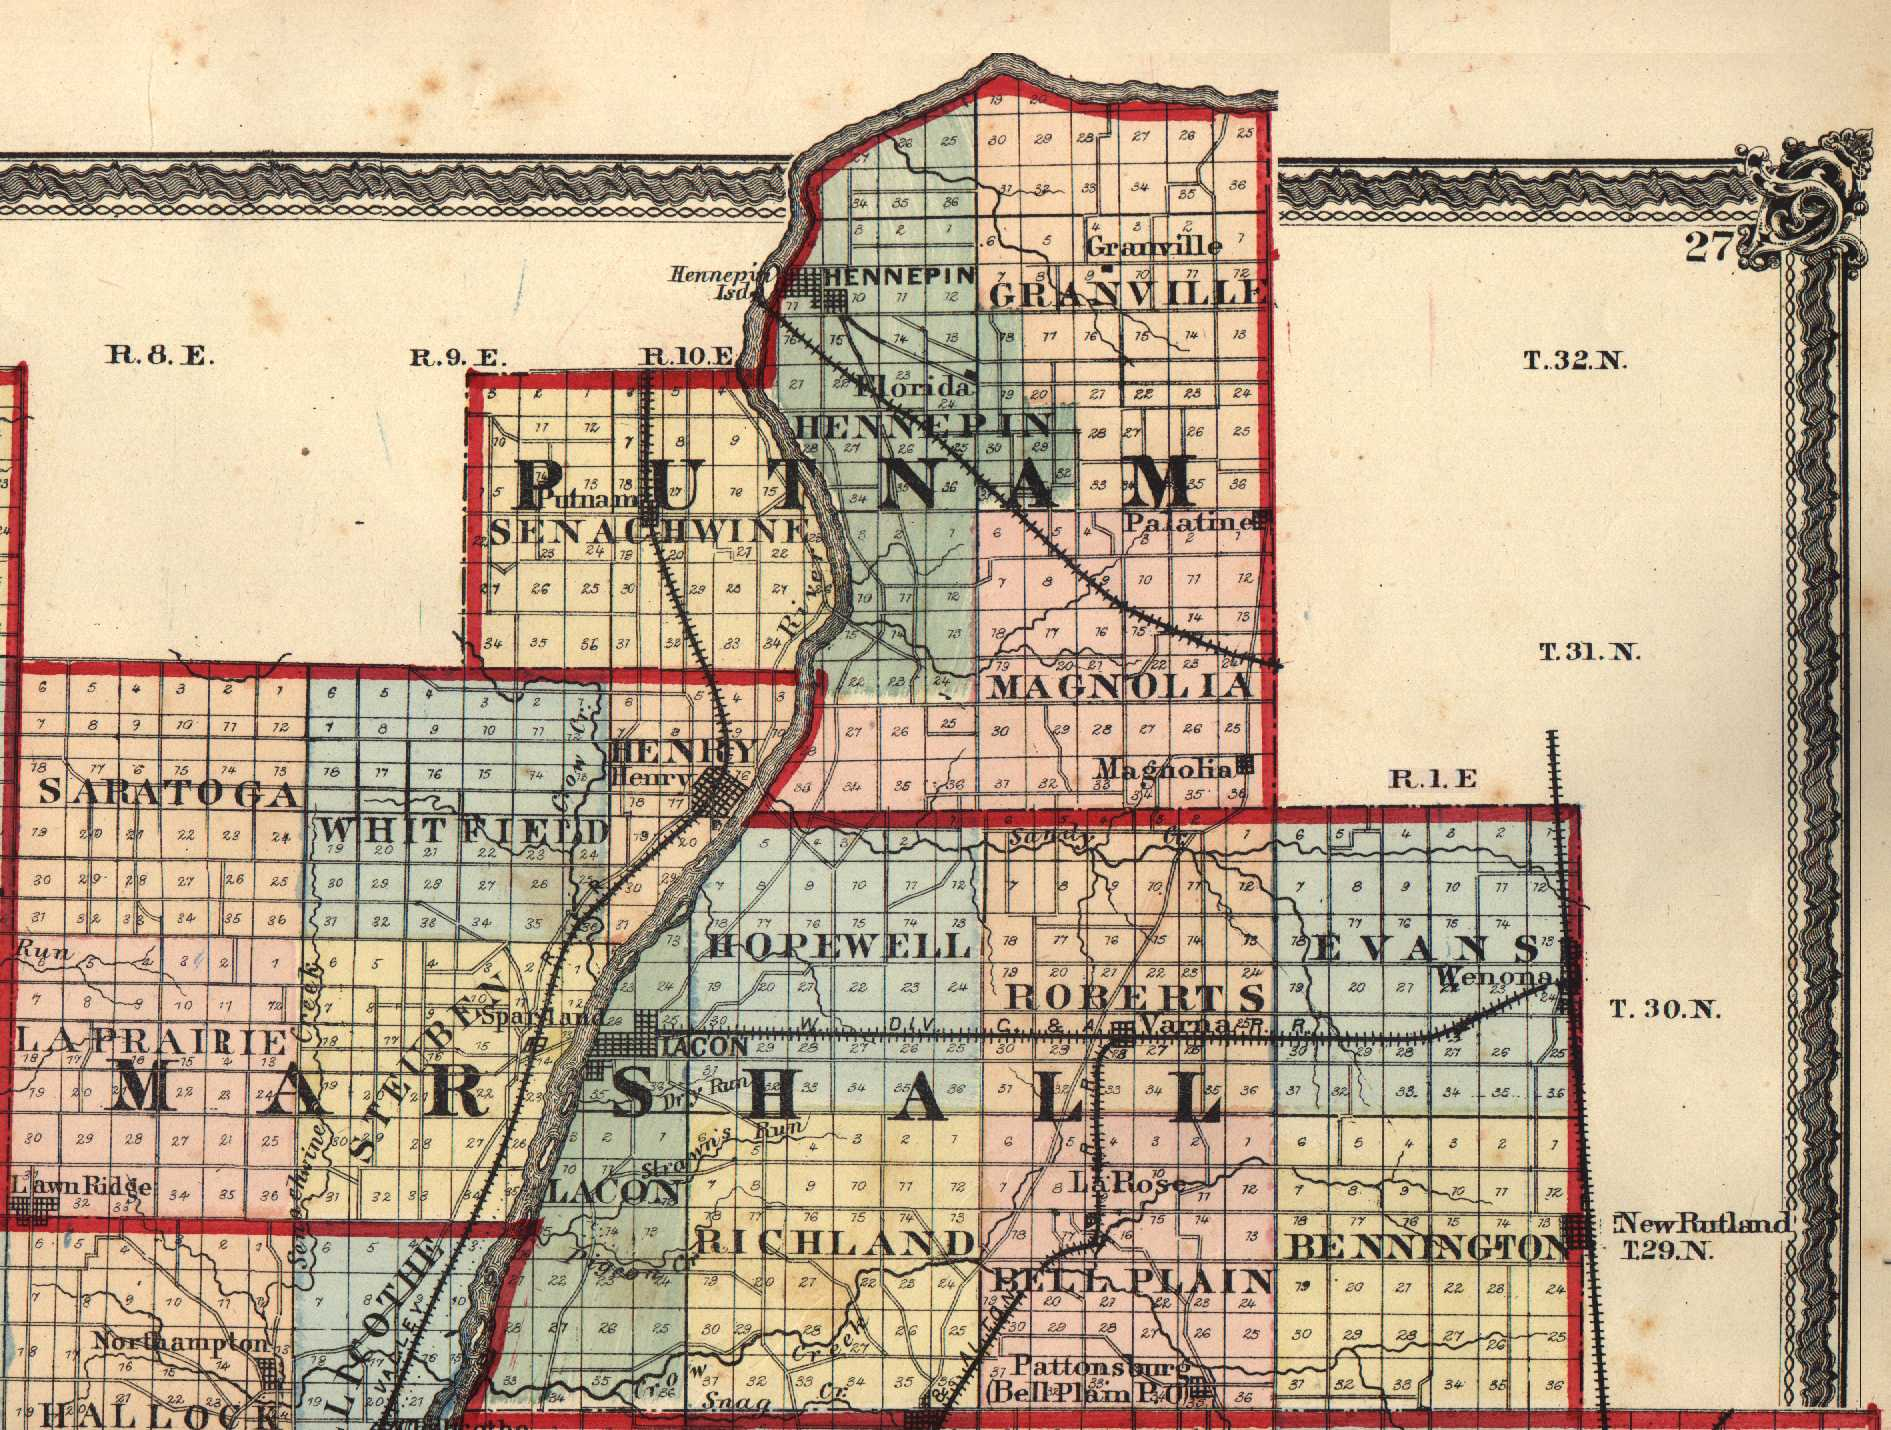 Putnam County, Illinois: Maps and Gazetteers on clinton county indiana township map, putnam county ohio road map, putnam county florida zip code map, dutchess county new york map, wayne county indiana cities map,